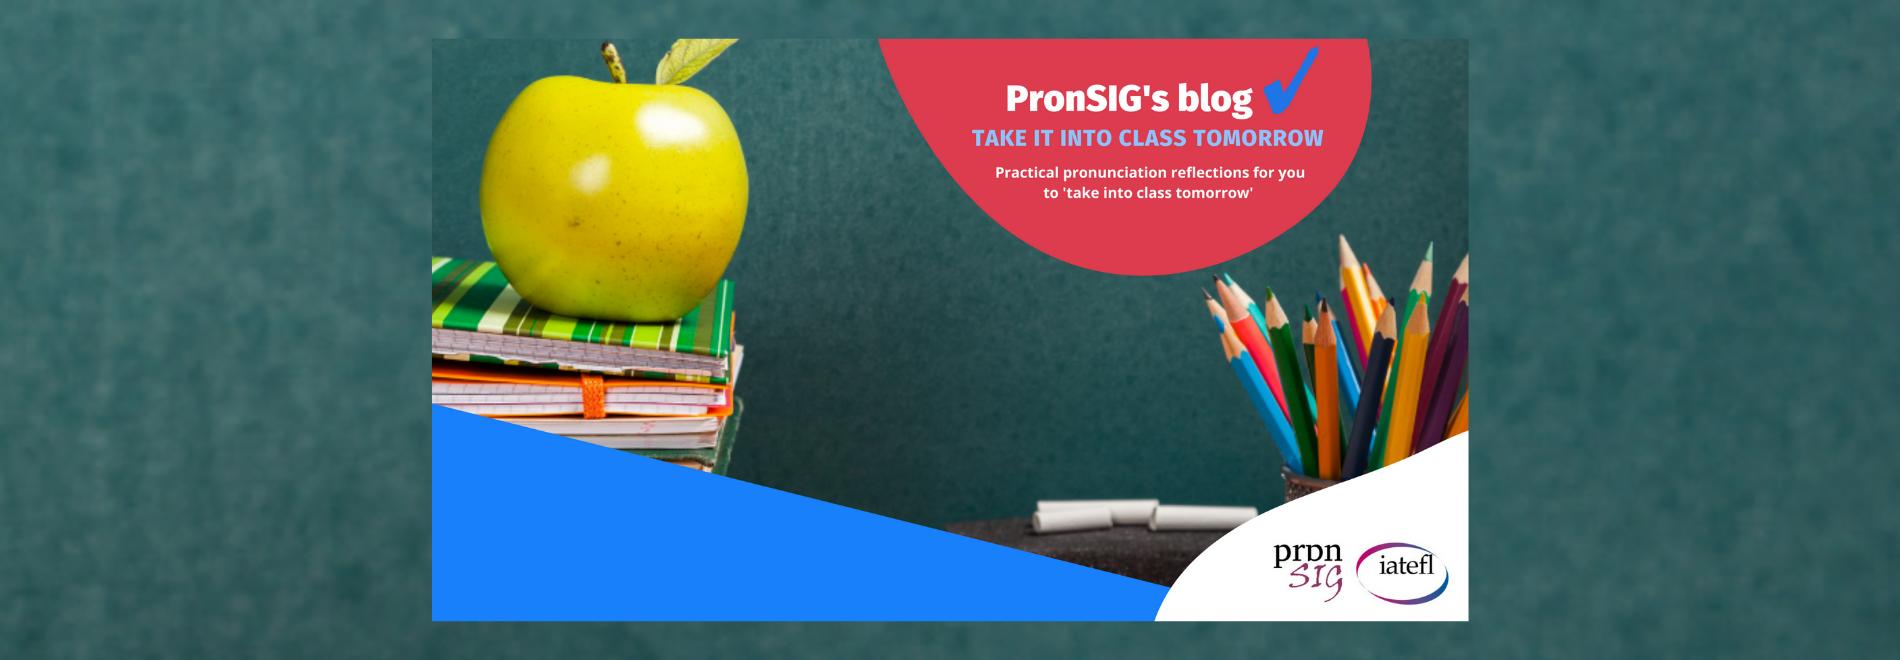 PronSIG's blog